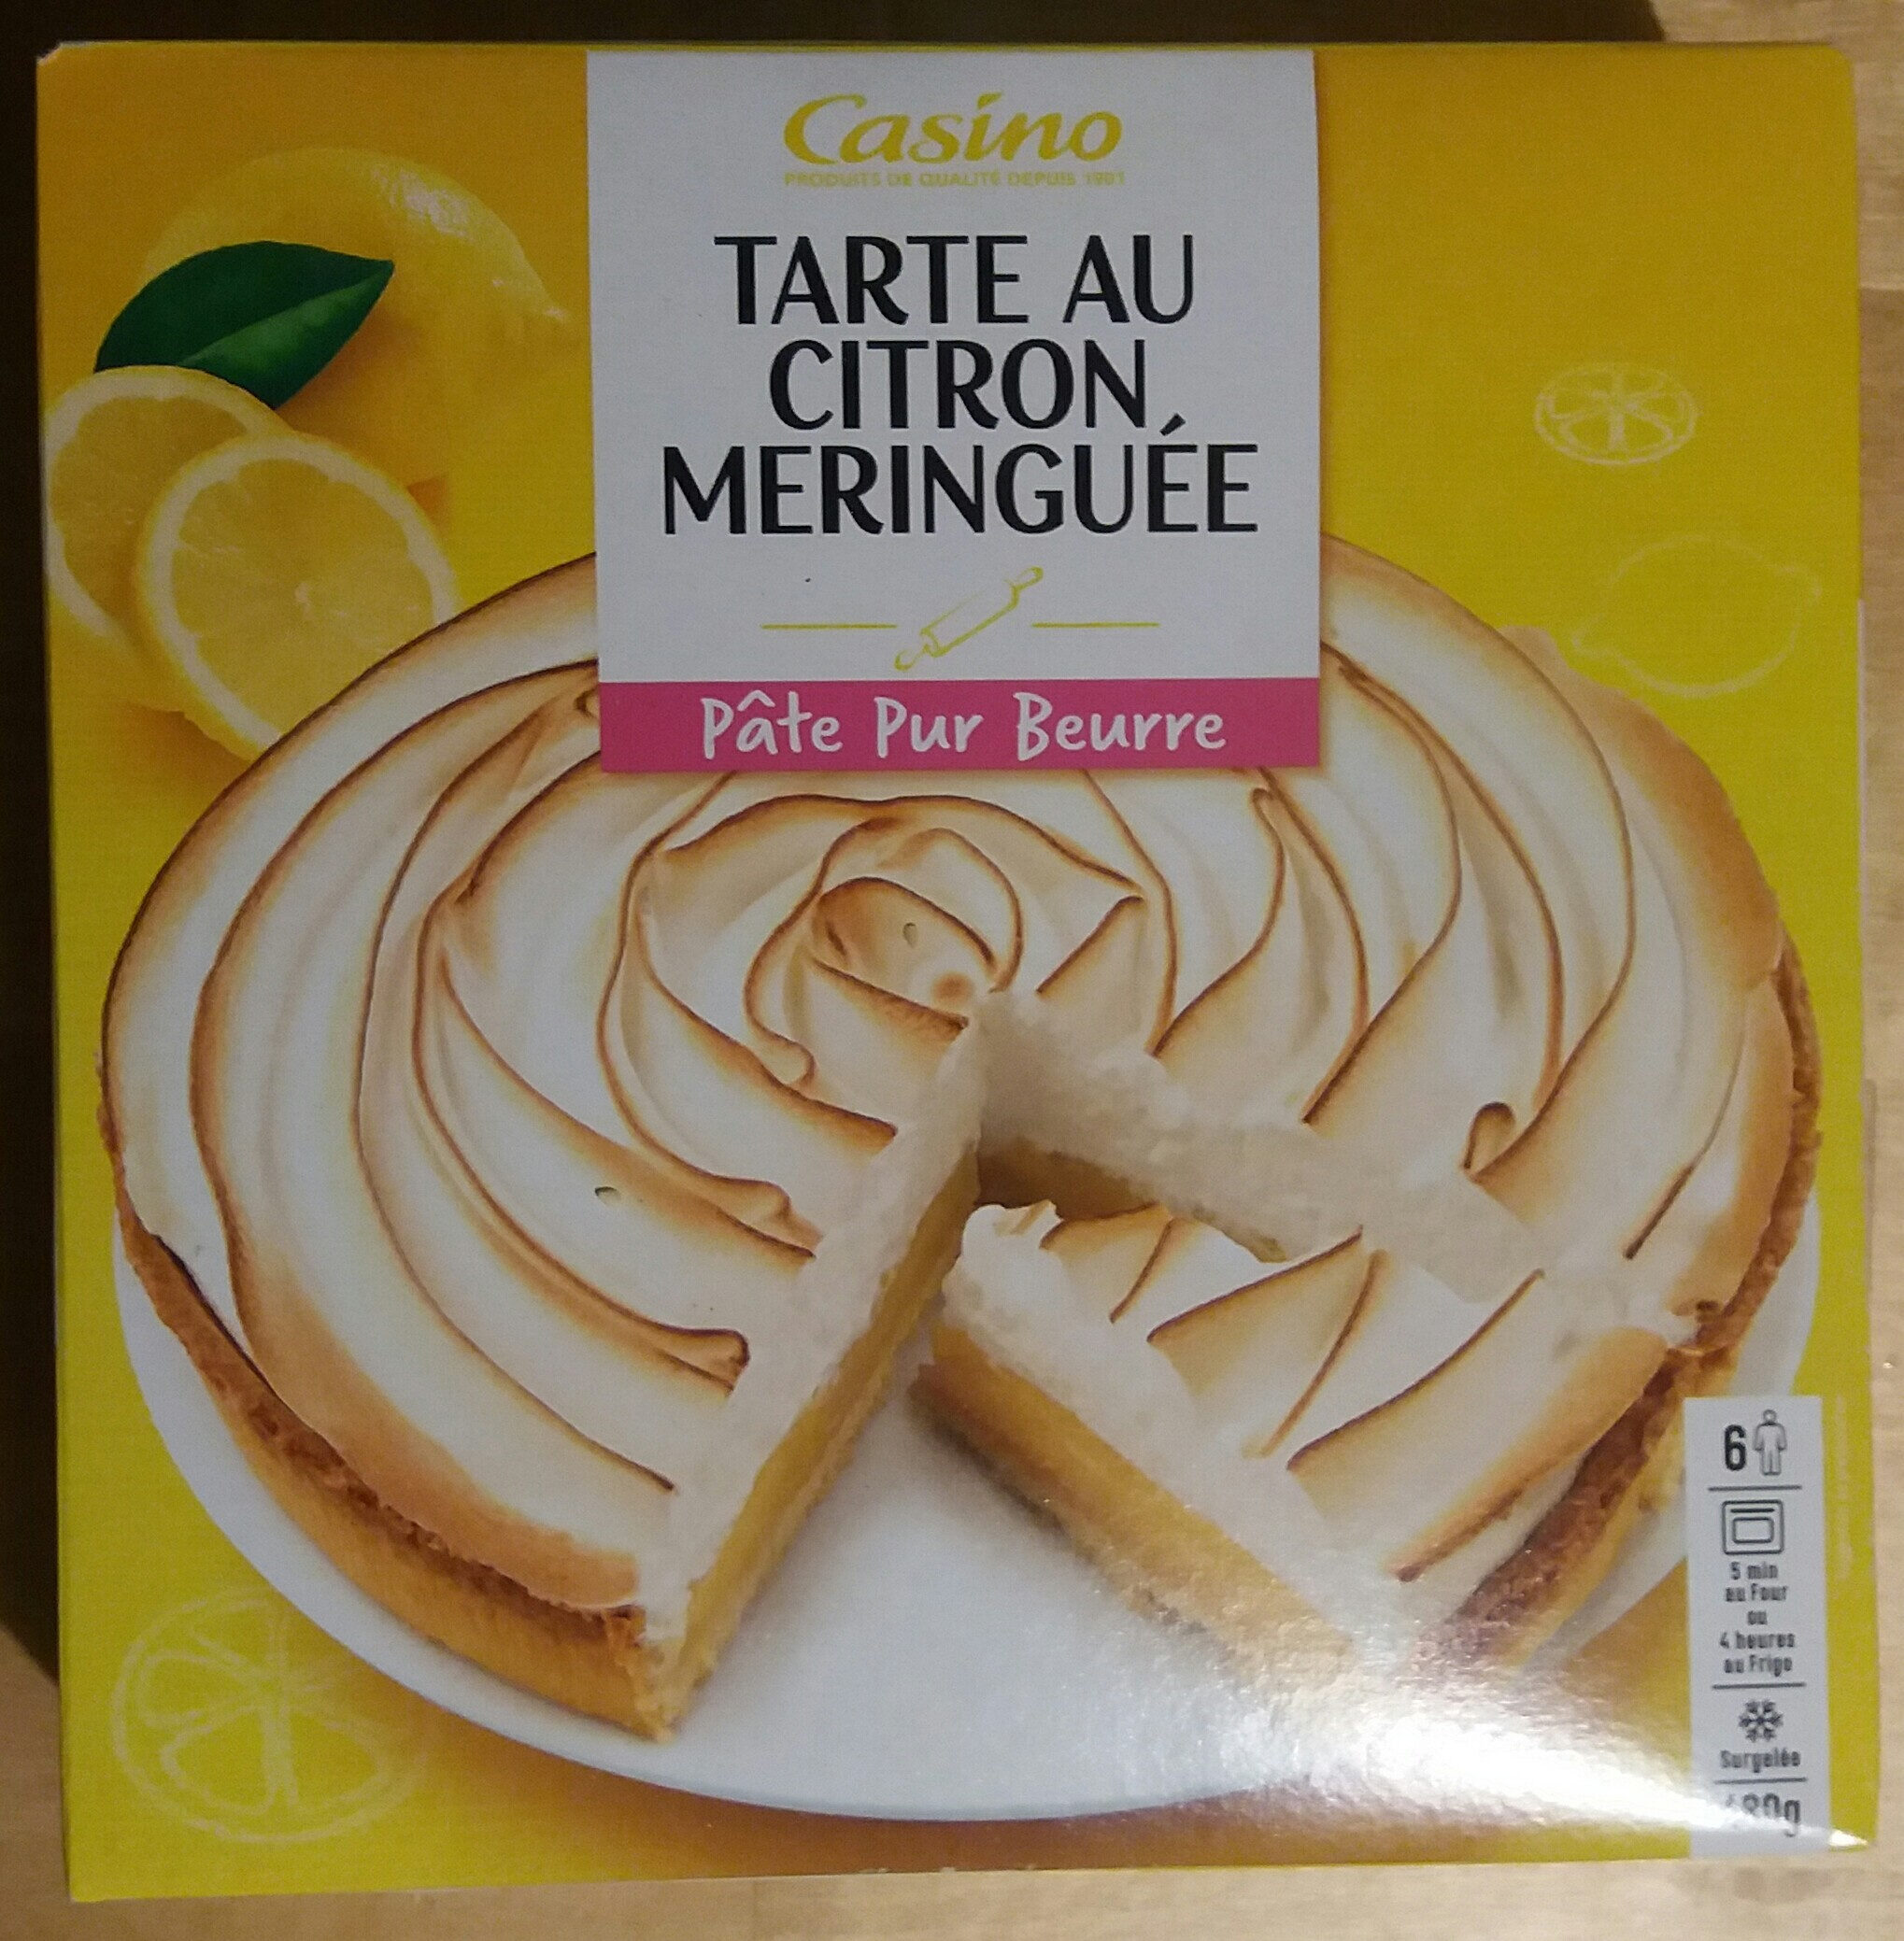 Tarte citron meringuée - Product - fr